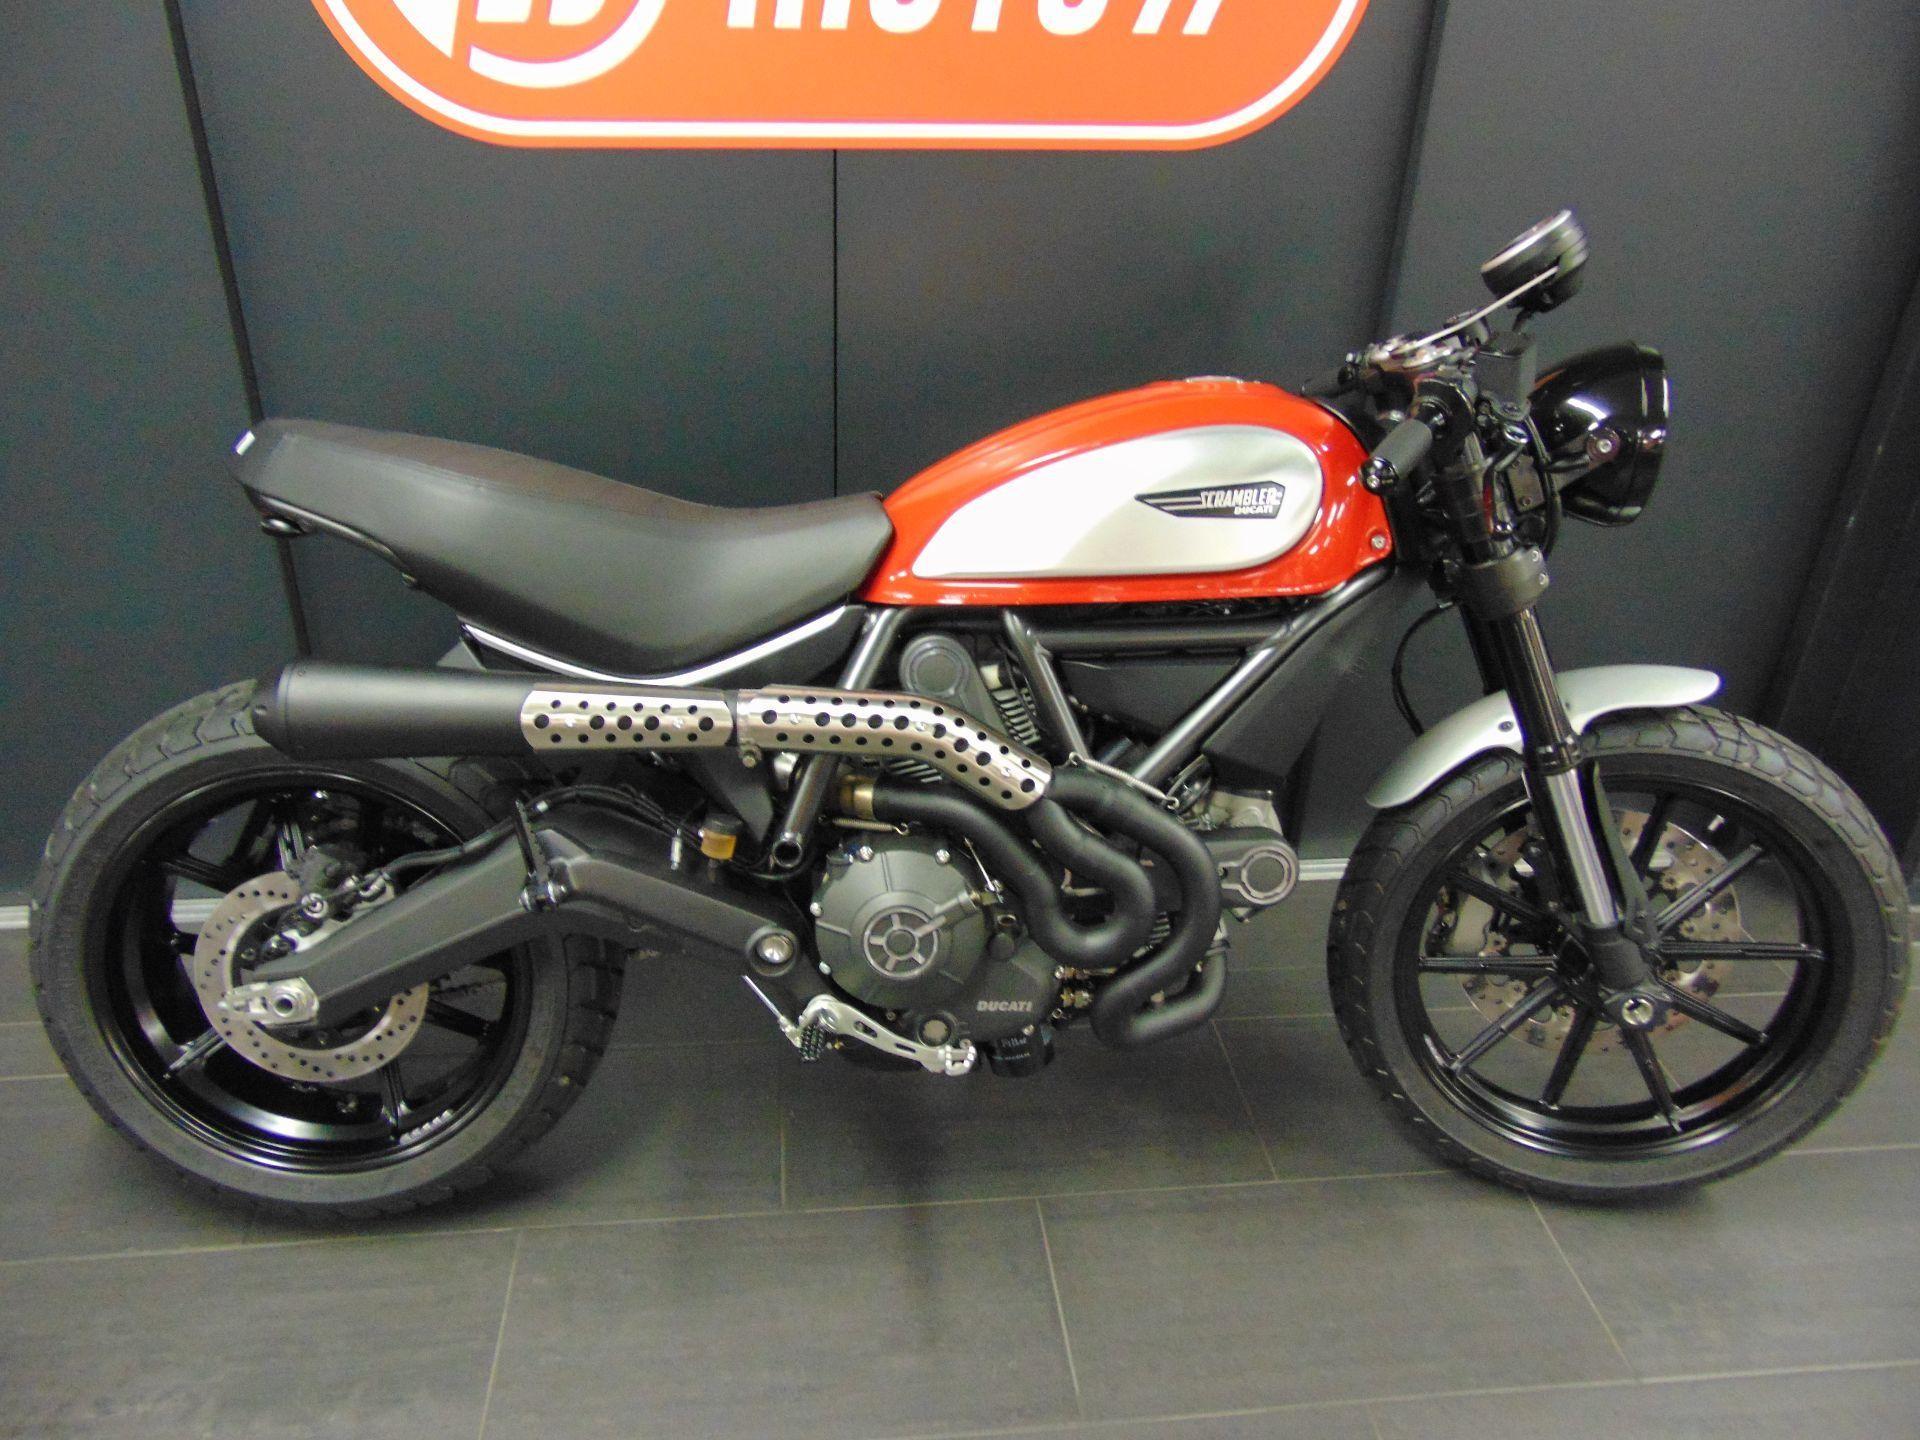 motorrad vorjahresmodell kaufen ducati 800 scrambler abs red racer moto77 ag frauenfeld. Black Bedroom Furniture Sets. Home Design Ideas